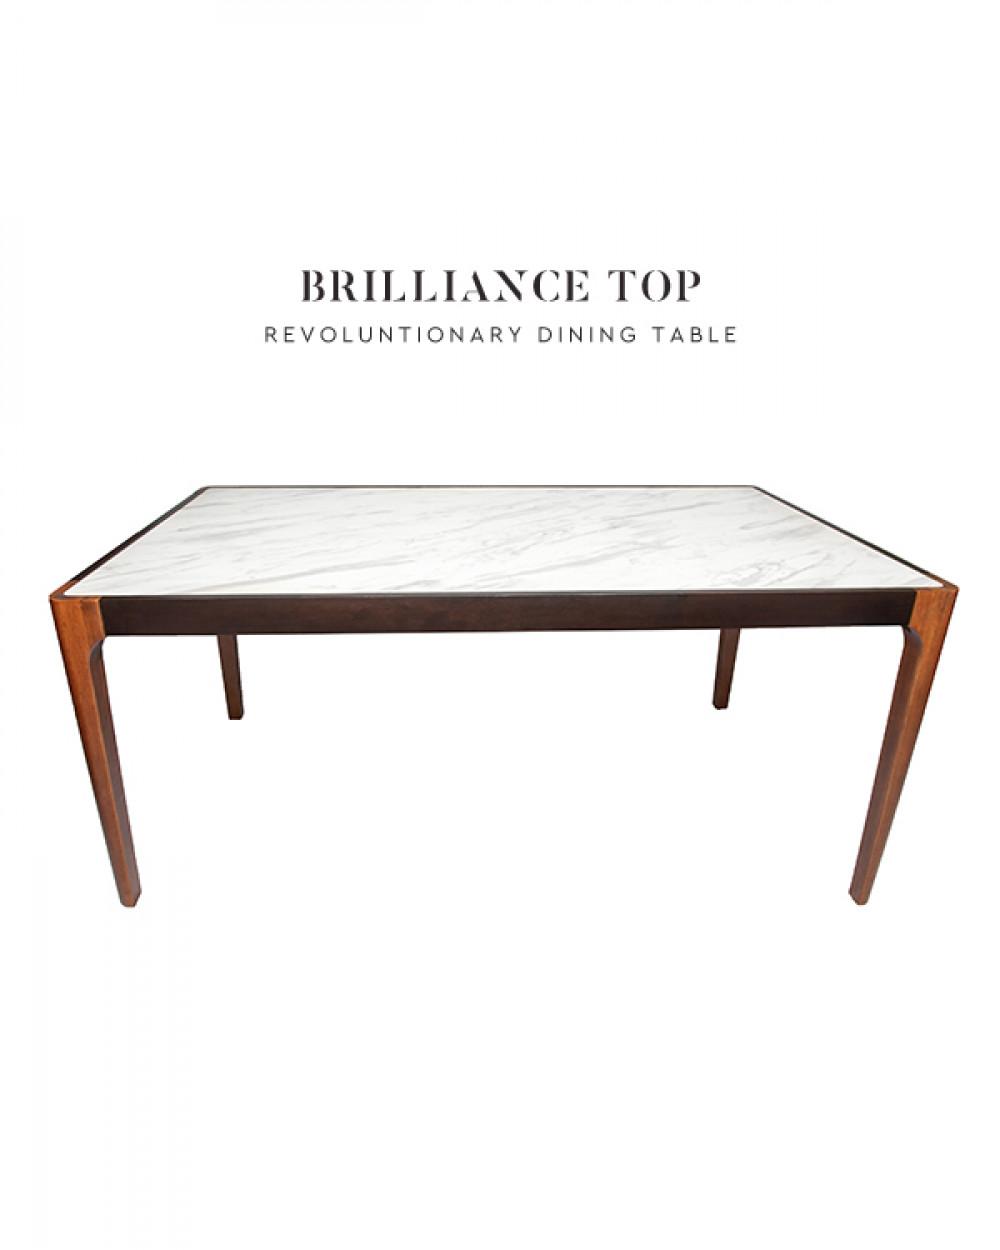 Brilliance Top